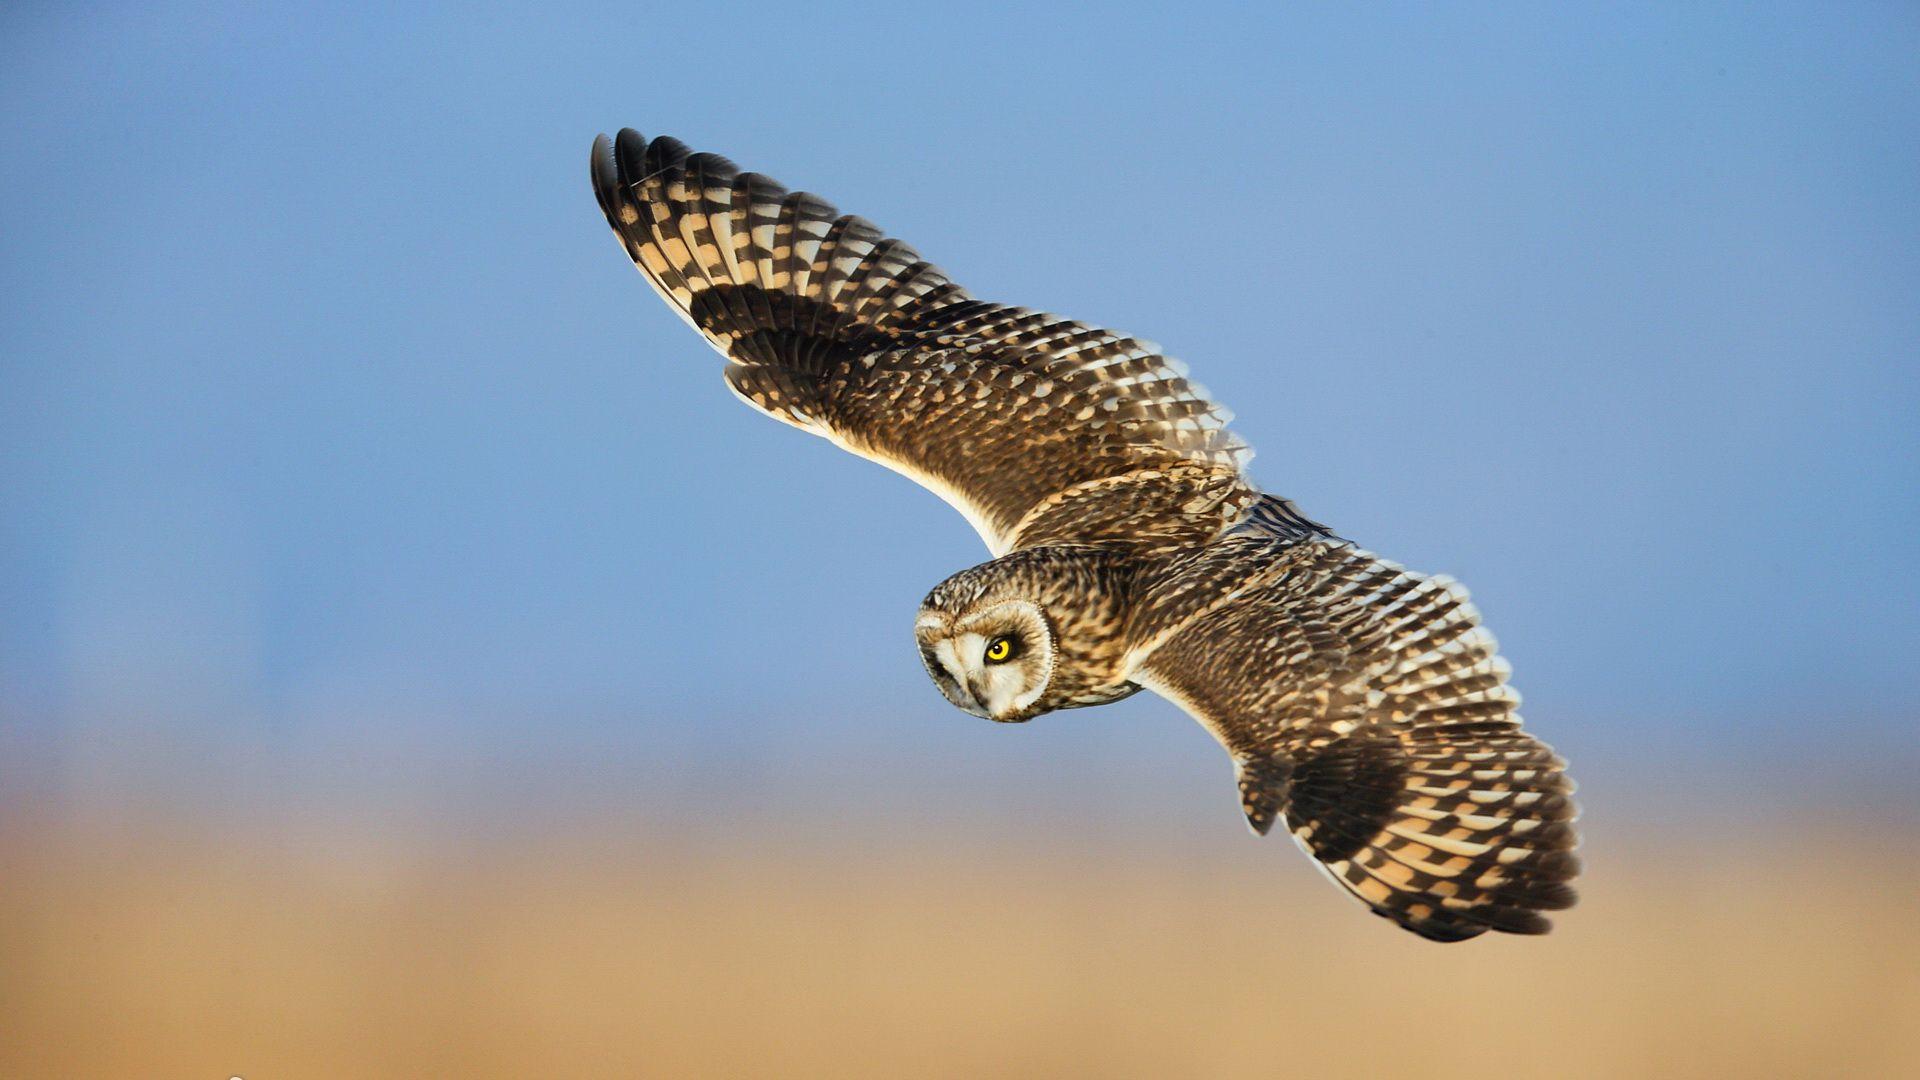 Pin By Cindy Bekker On Die Zauberhafte Tierwelt Von A Z S Short Eared Owl Owl Bird Wallpaper